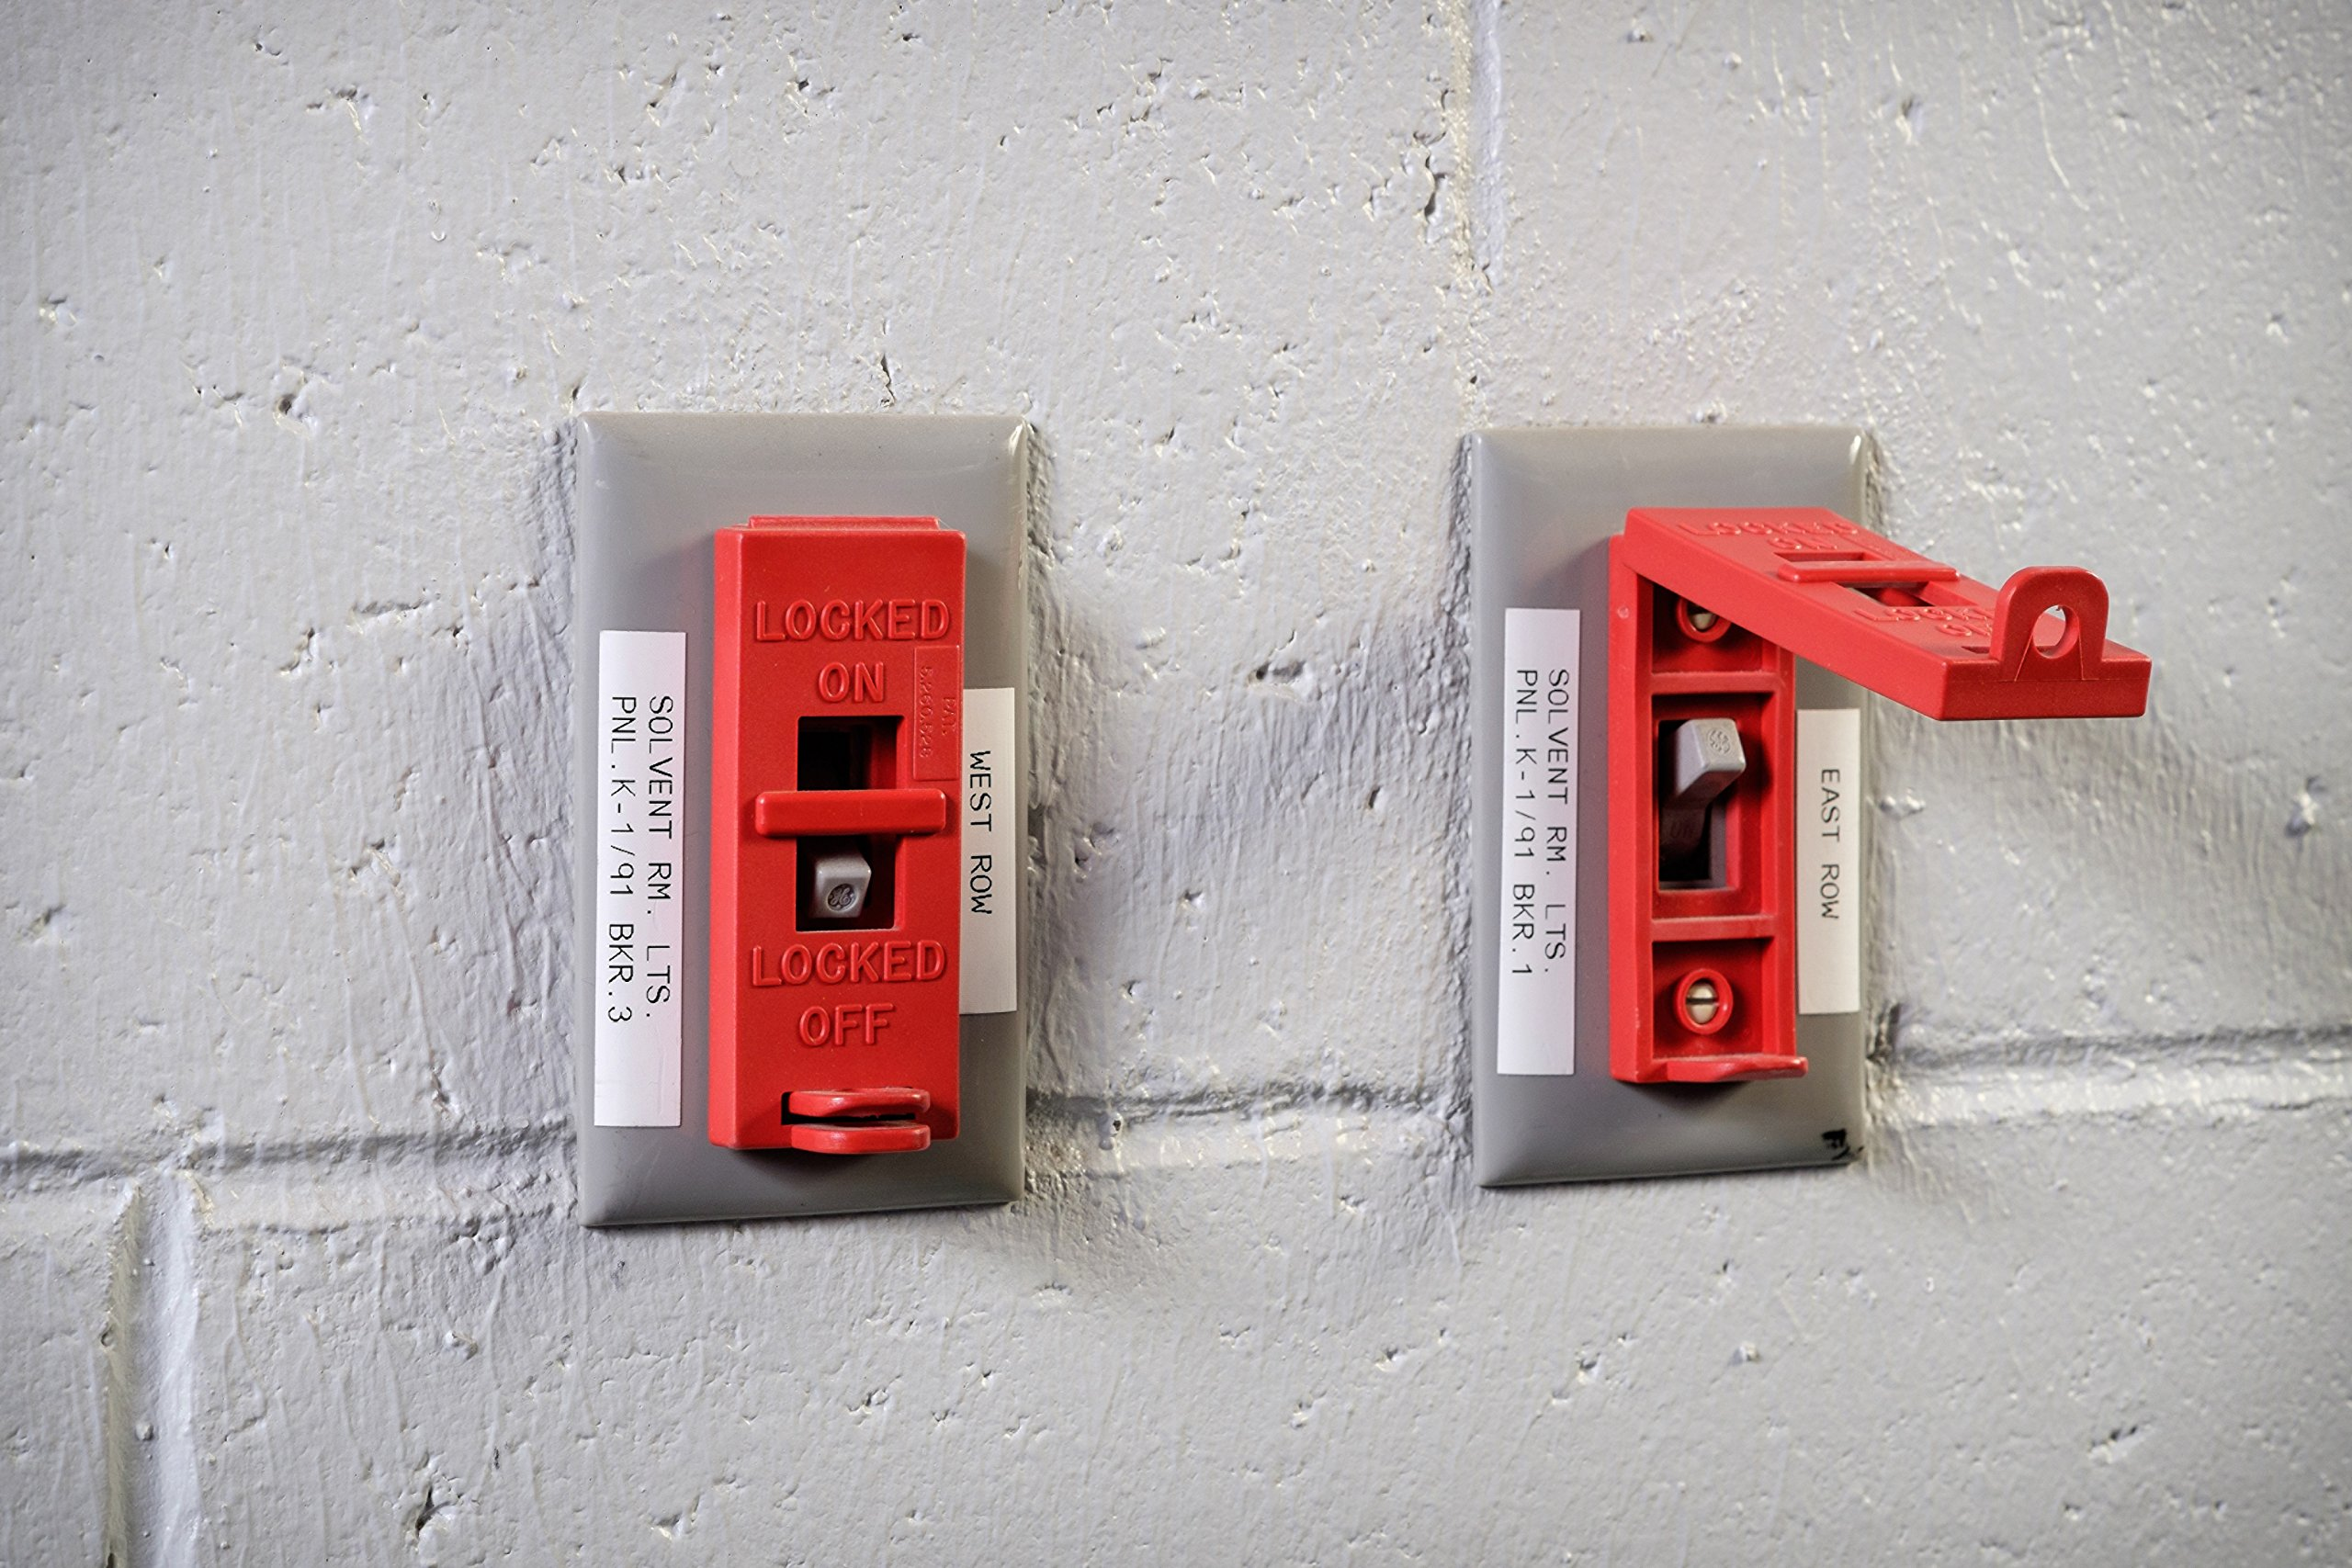 Brady 95548 Portable Lockout Kit, Fill, Electrical, Pouch by Brady (Image #5)